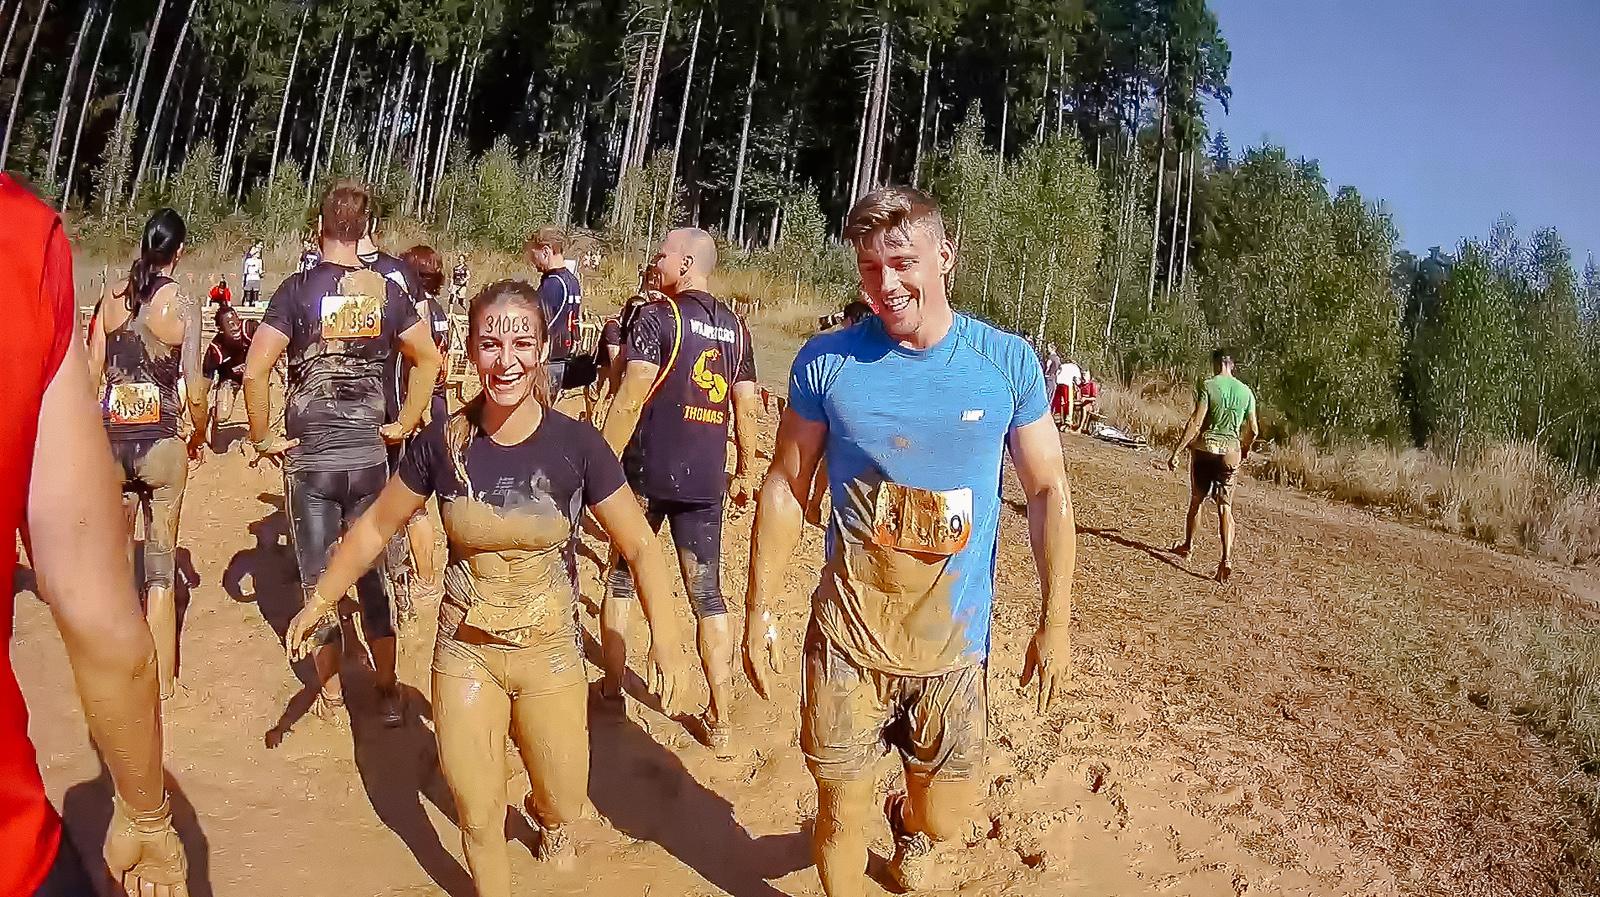 fitnessblog-fitnessblogger-fitness-blog-blogger-stuttgart-dreamteamfitness-tough-mudder-113